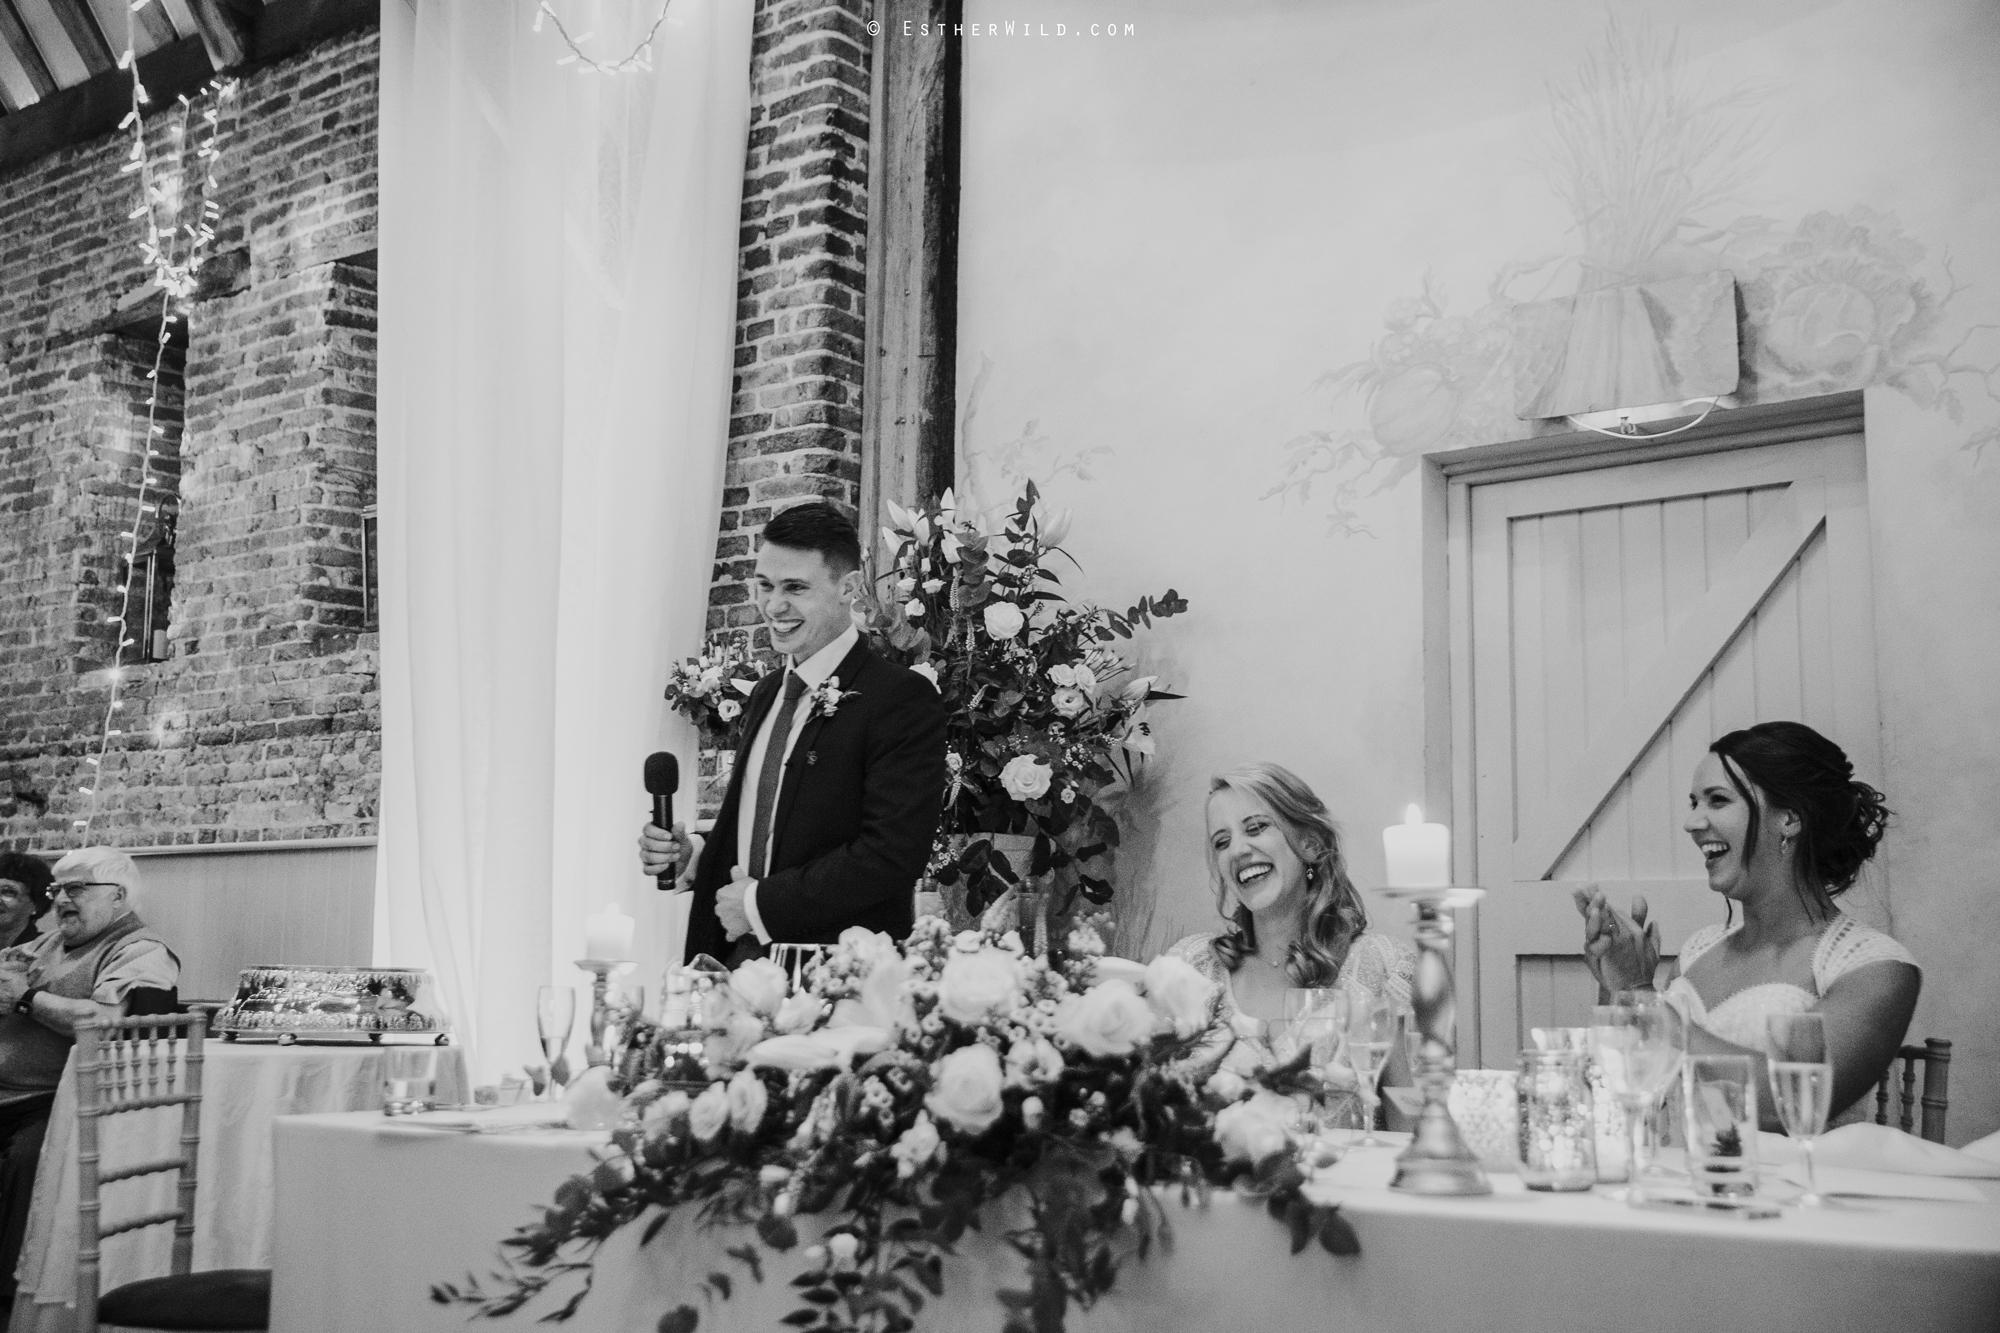 Elms_Barn_Weddings_Suffolk_Photographer_Copyright_Esther_Wild_IMG_2825-2.jpg